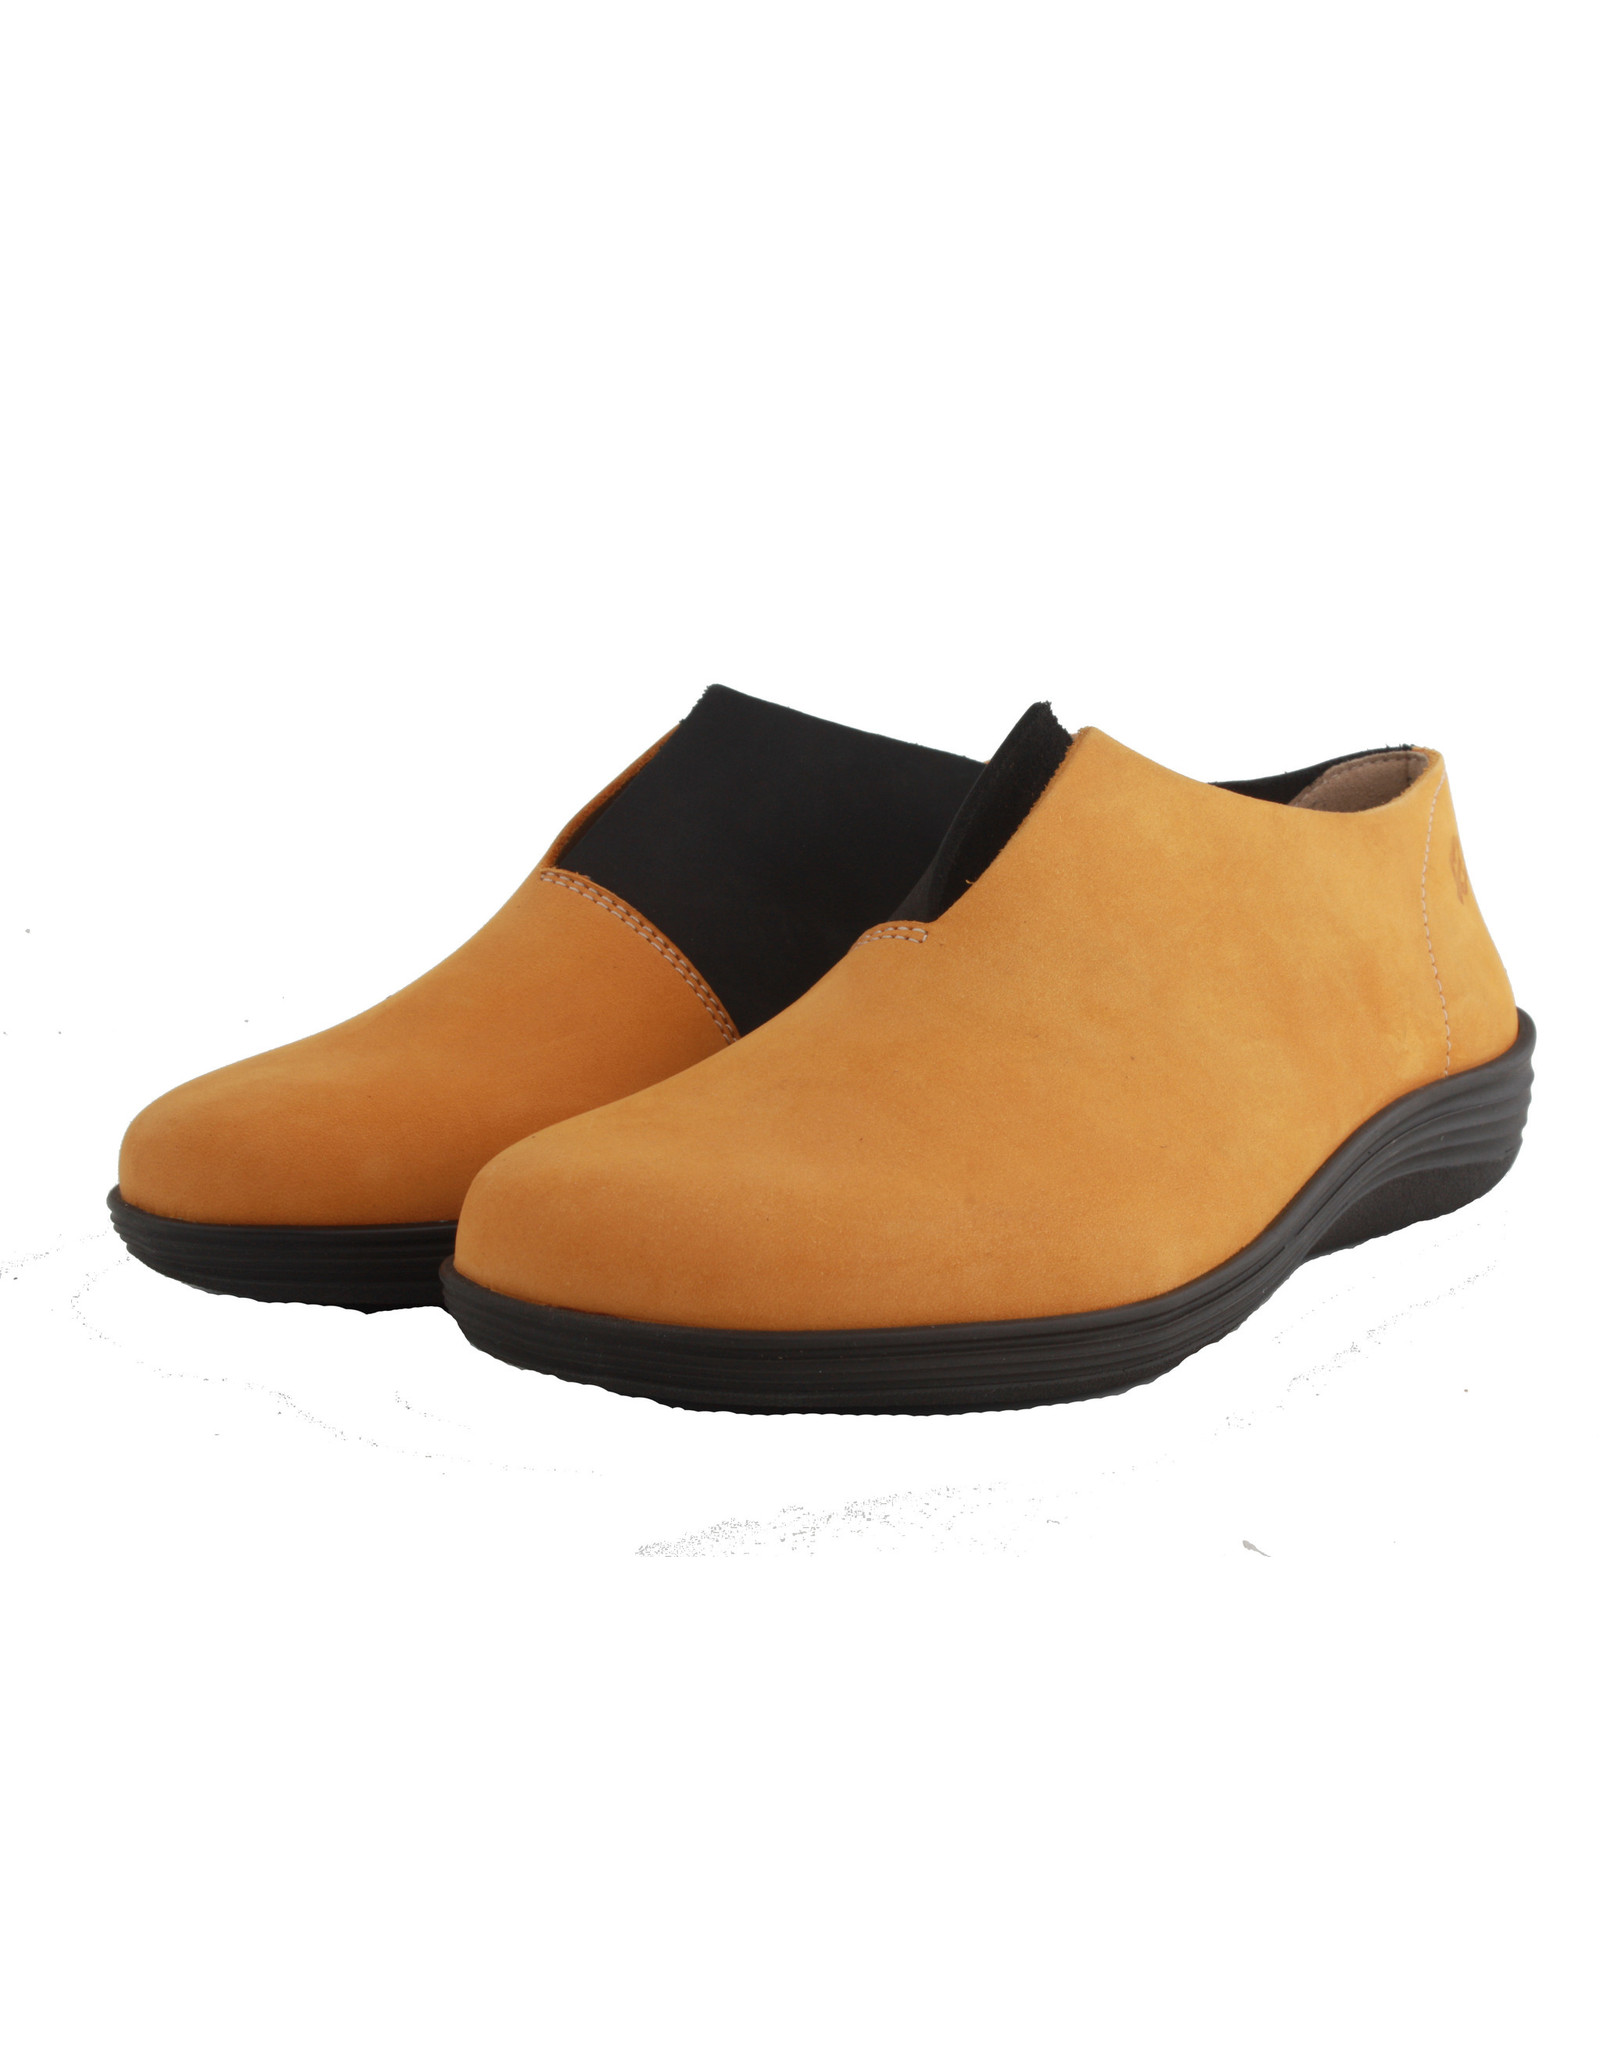 Loints Circle 79004 2425 yellow black